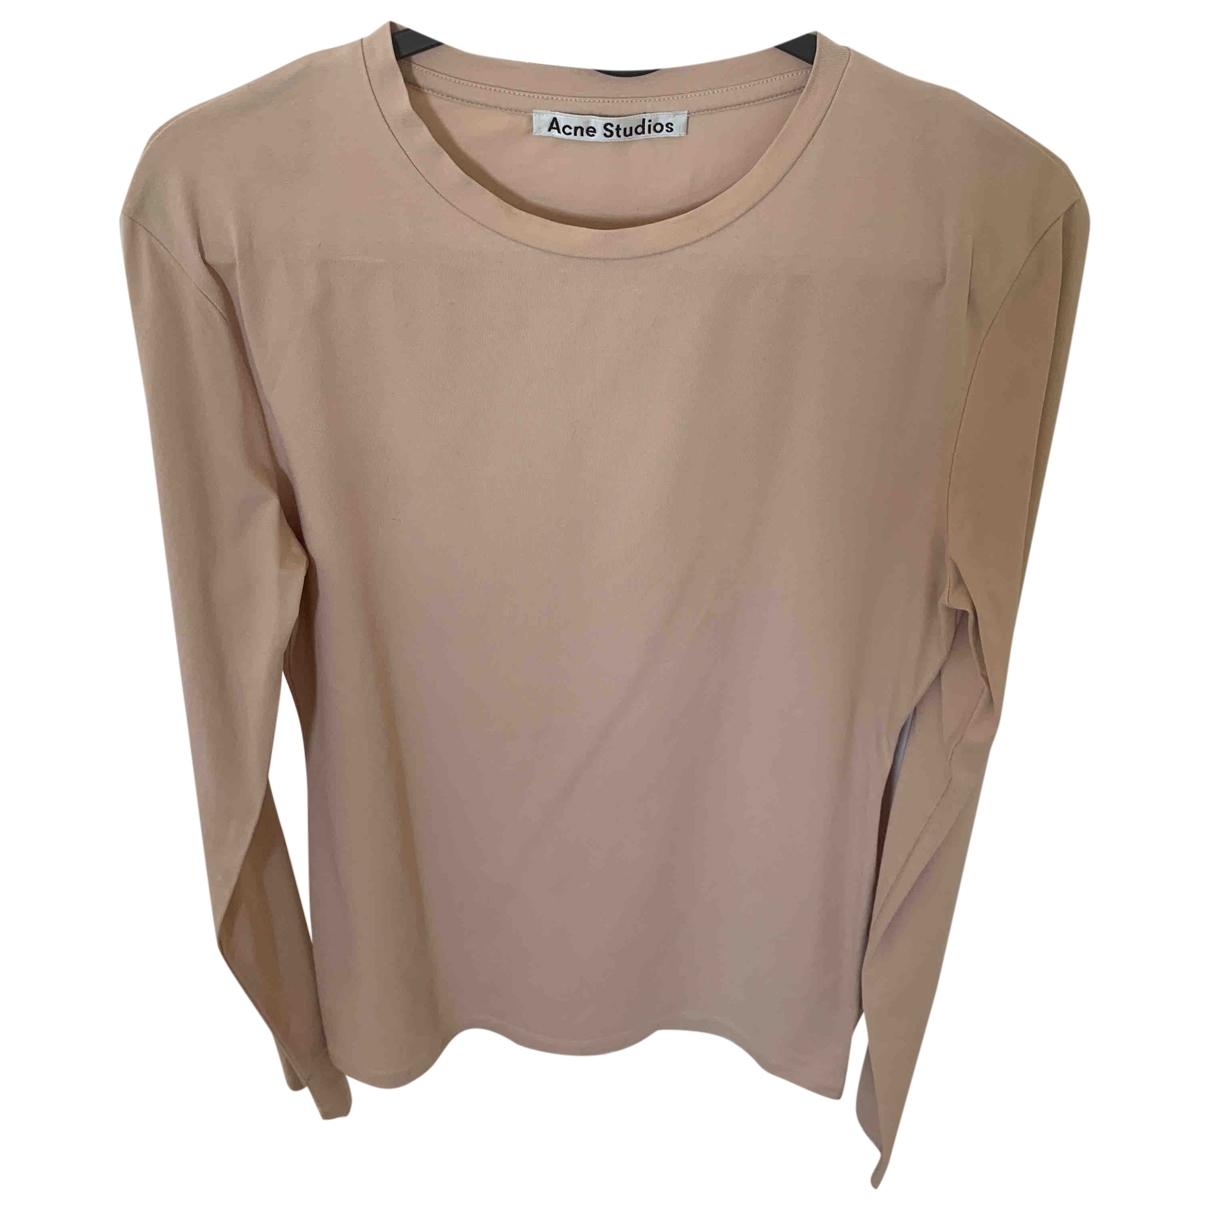 Acne Studios \N Pink Cotton  top for Women M International